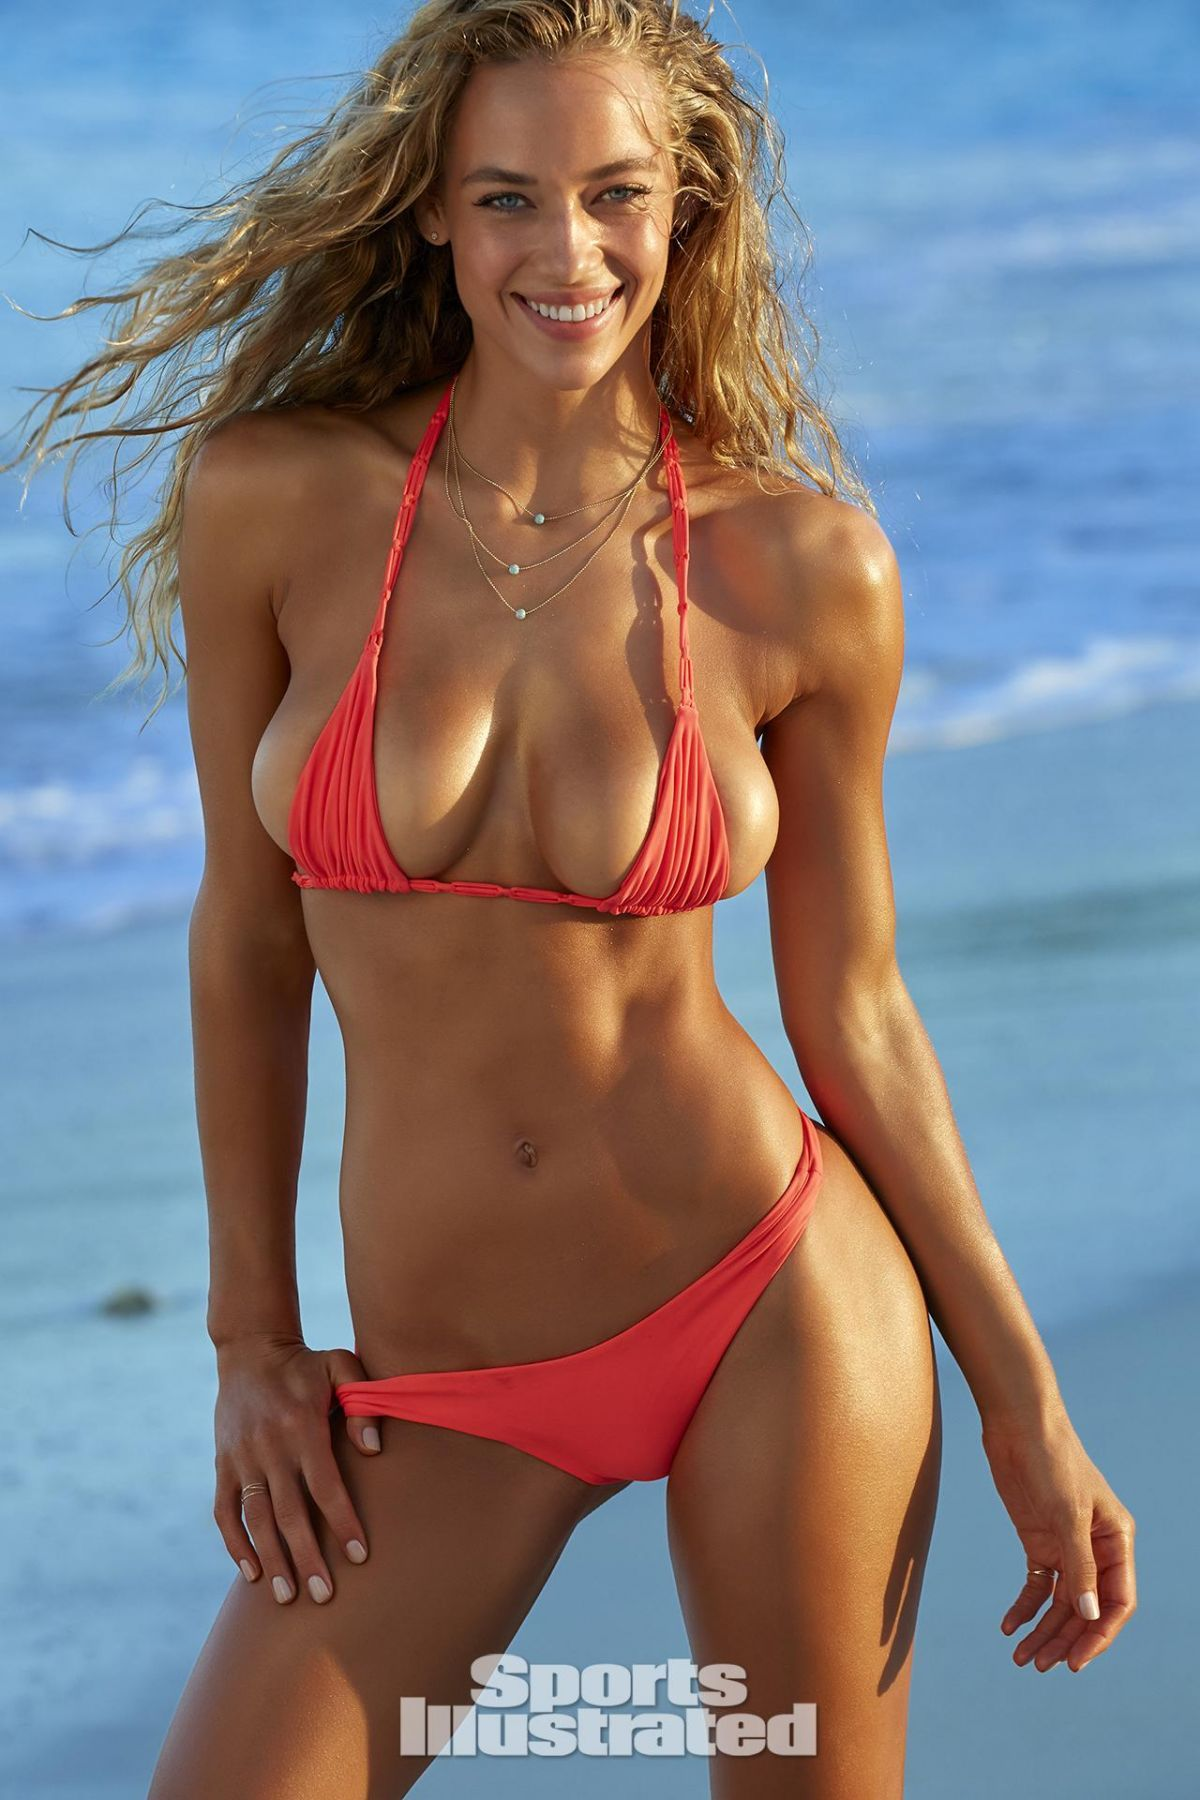 Hannah ferguson fappening nudes (76 photo), Boobs Celebrites fotos